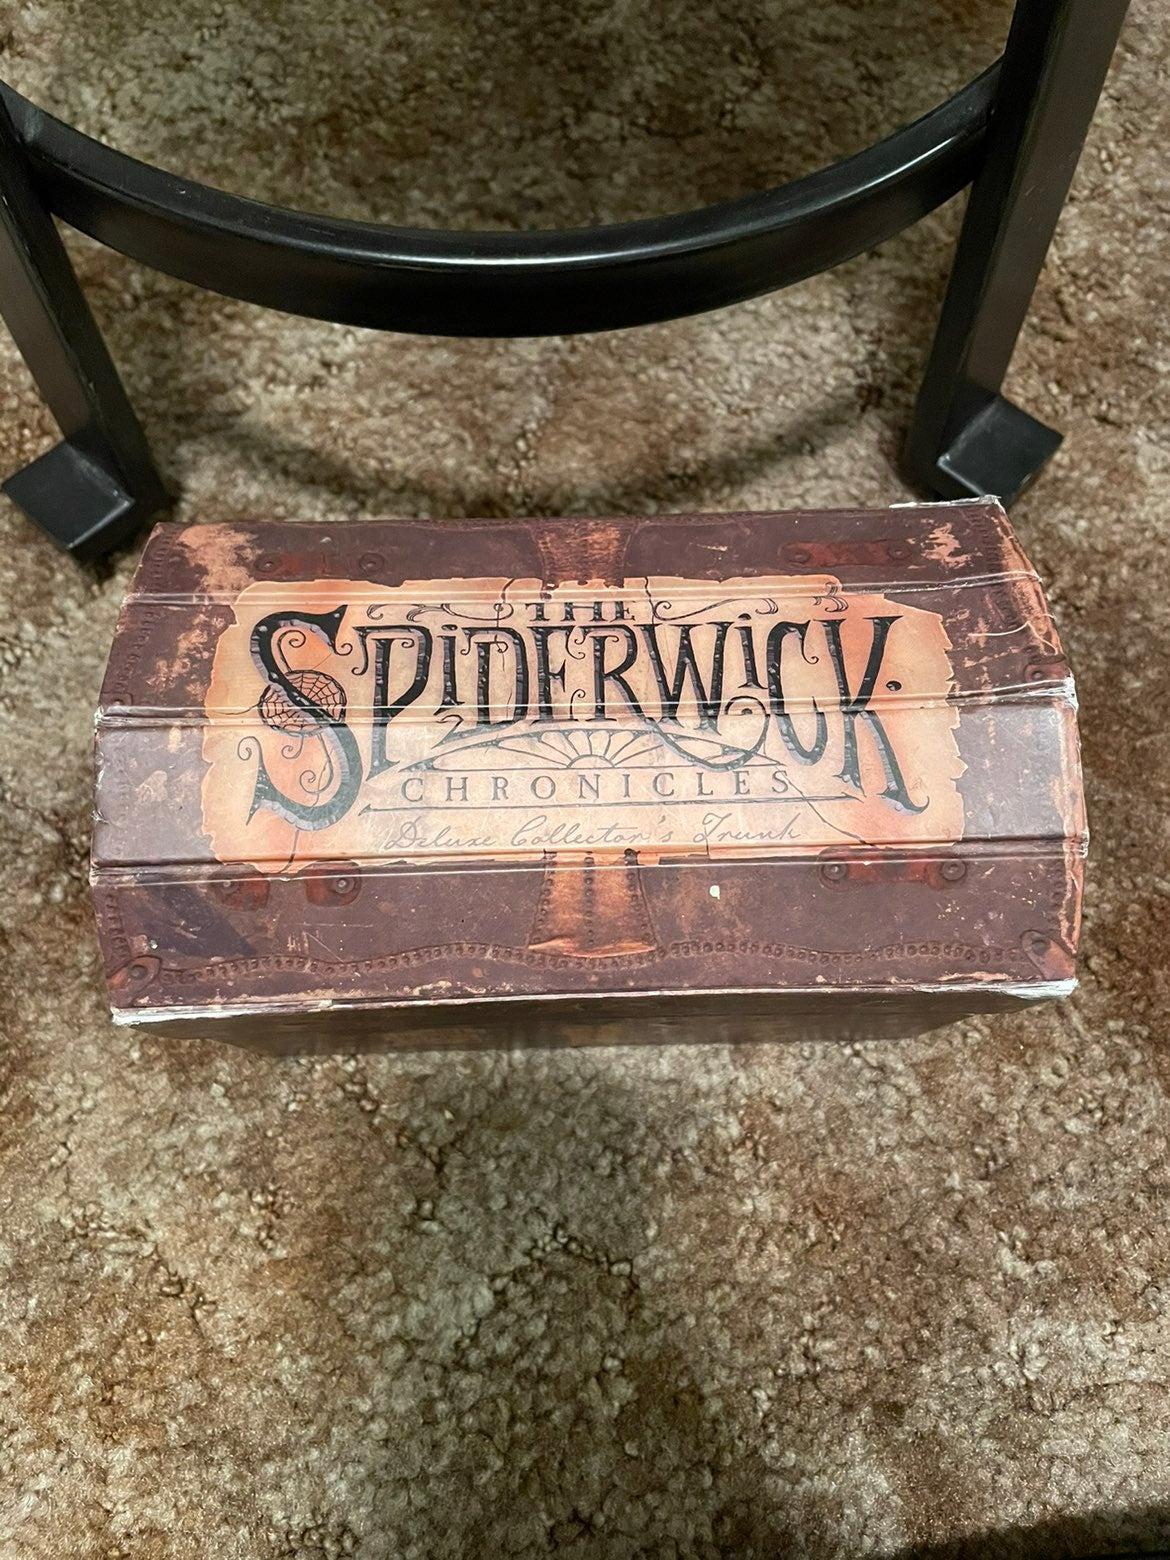 The Spiderwick Chronicles book set